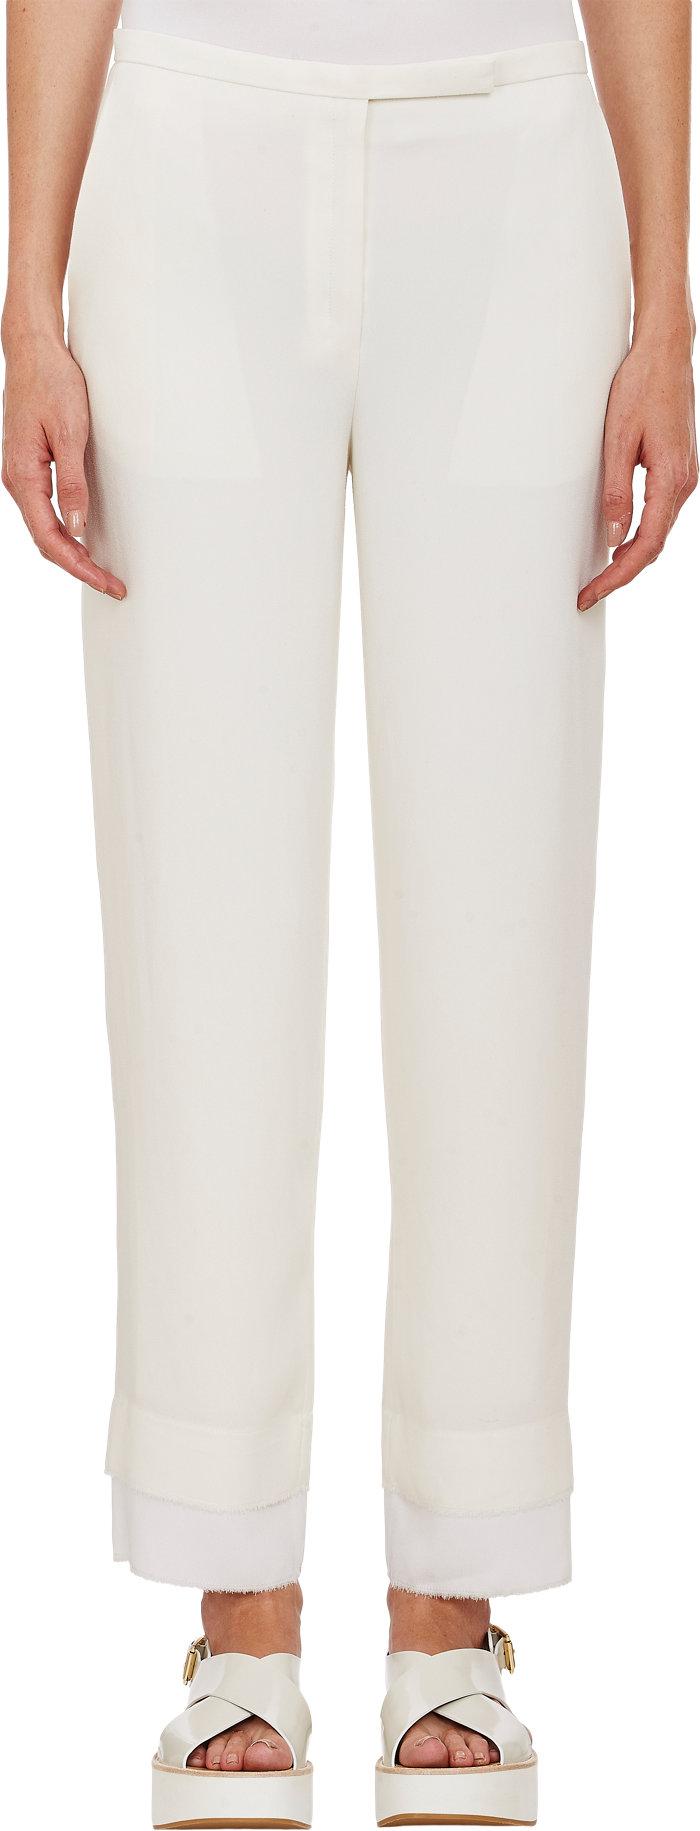 Edun White/Ivory Cropped Trousers (RPP �400)